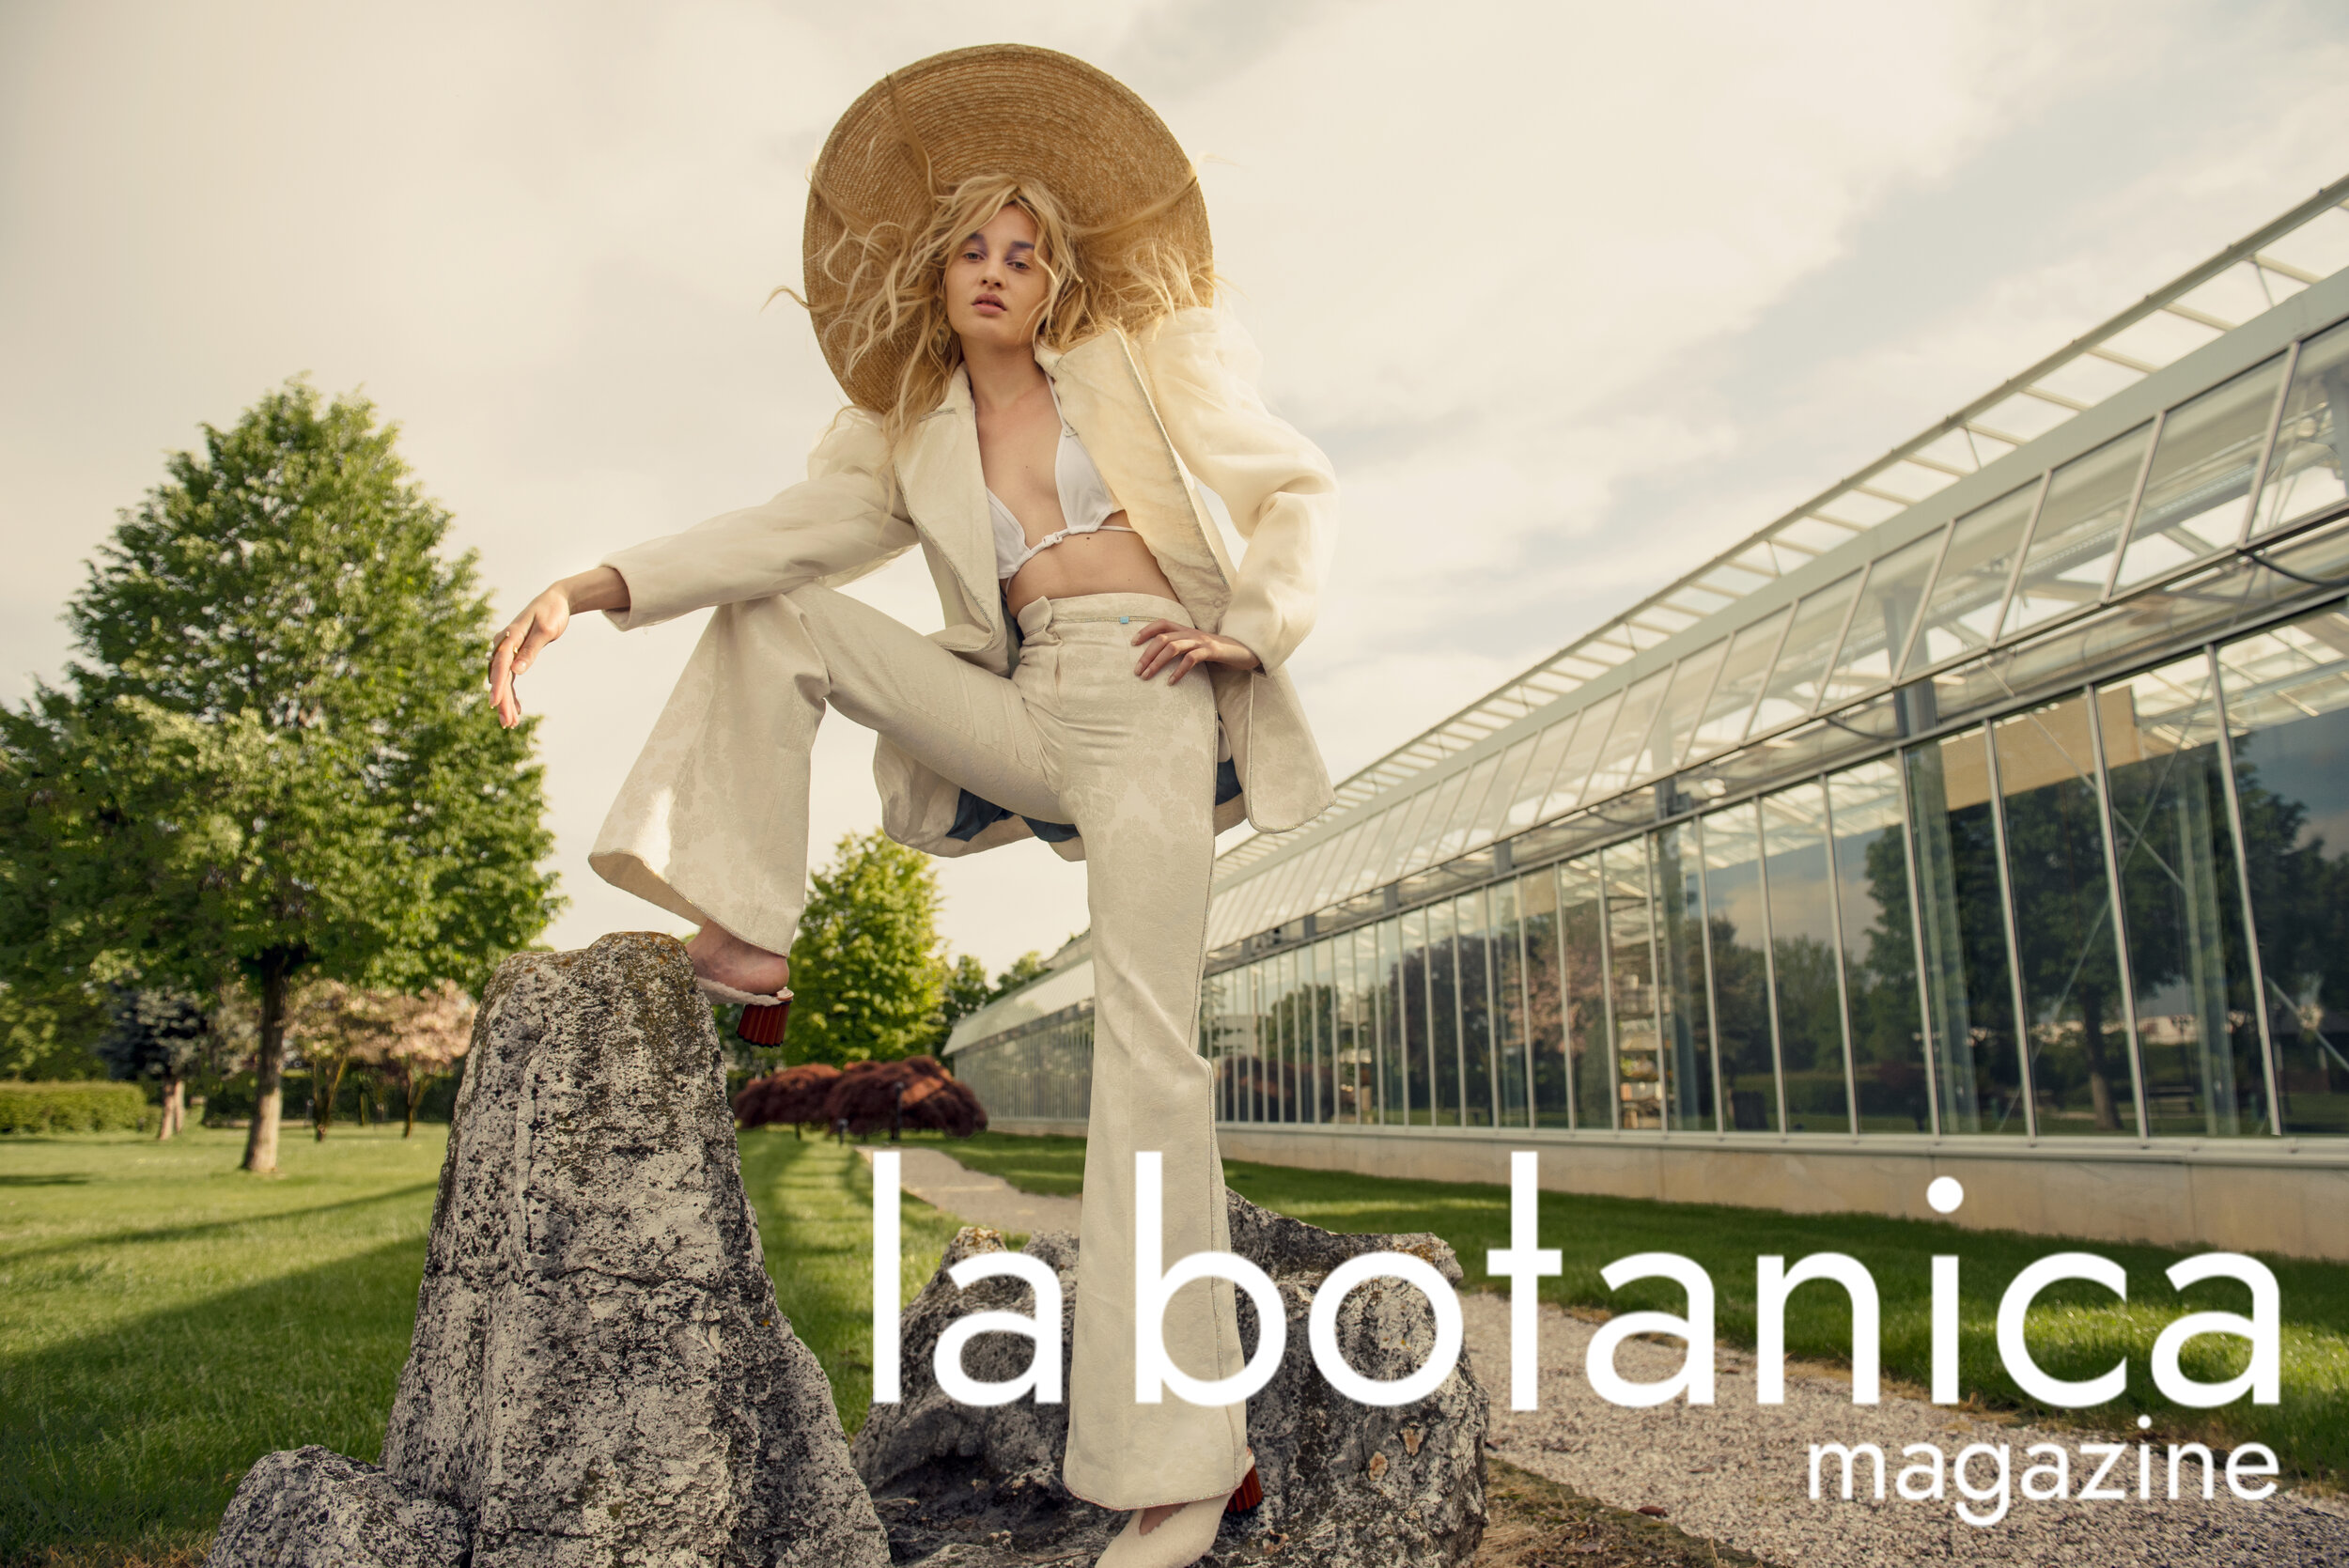 Hat MONTEGALLO. Jacket and trousers ANA LJUBINKOVIC. Swimsuit GIORGIA ANDREAZZA. Shoes SALAR MILANO. Ring SHARRA PAGANO